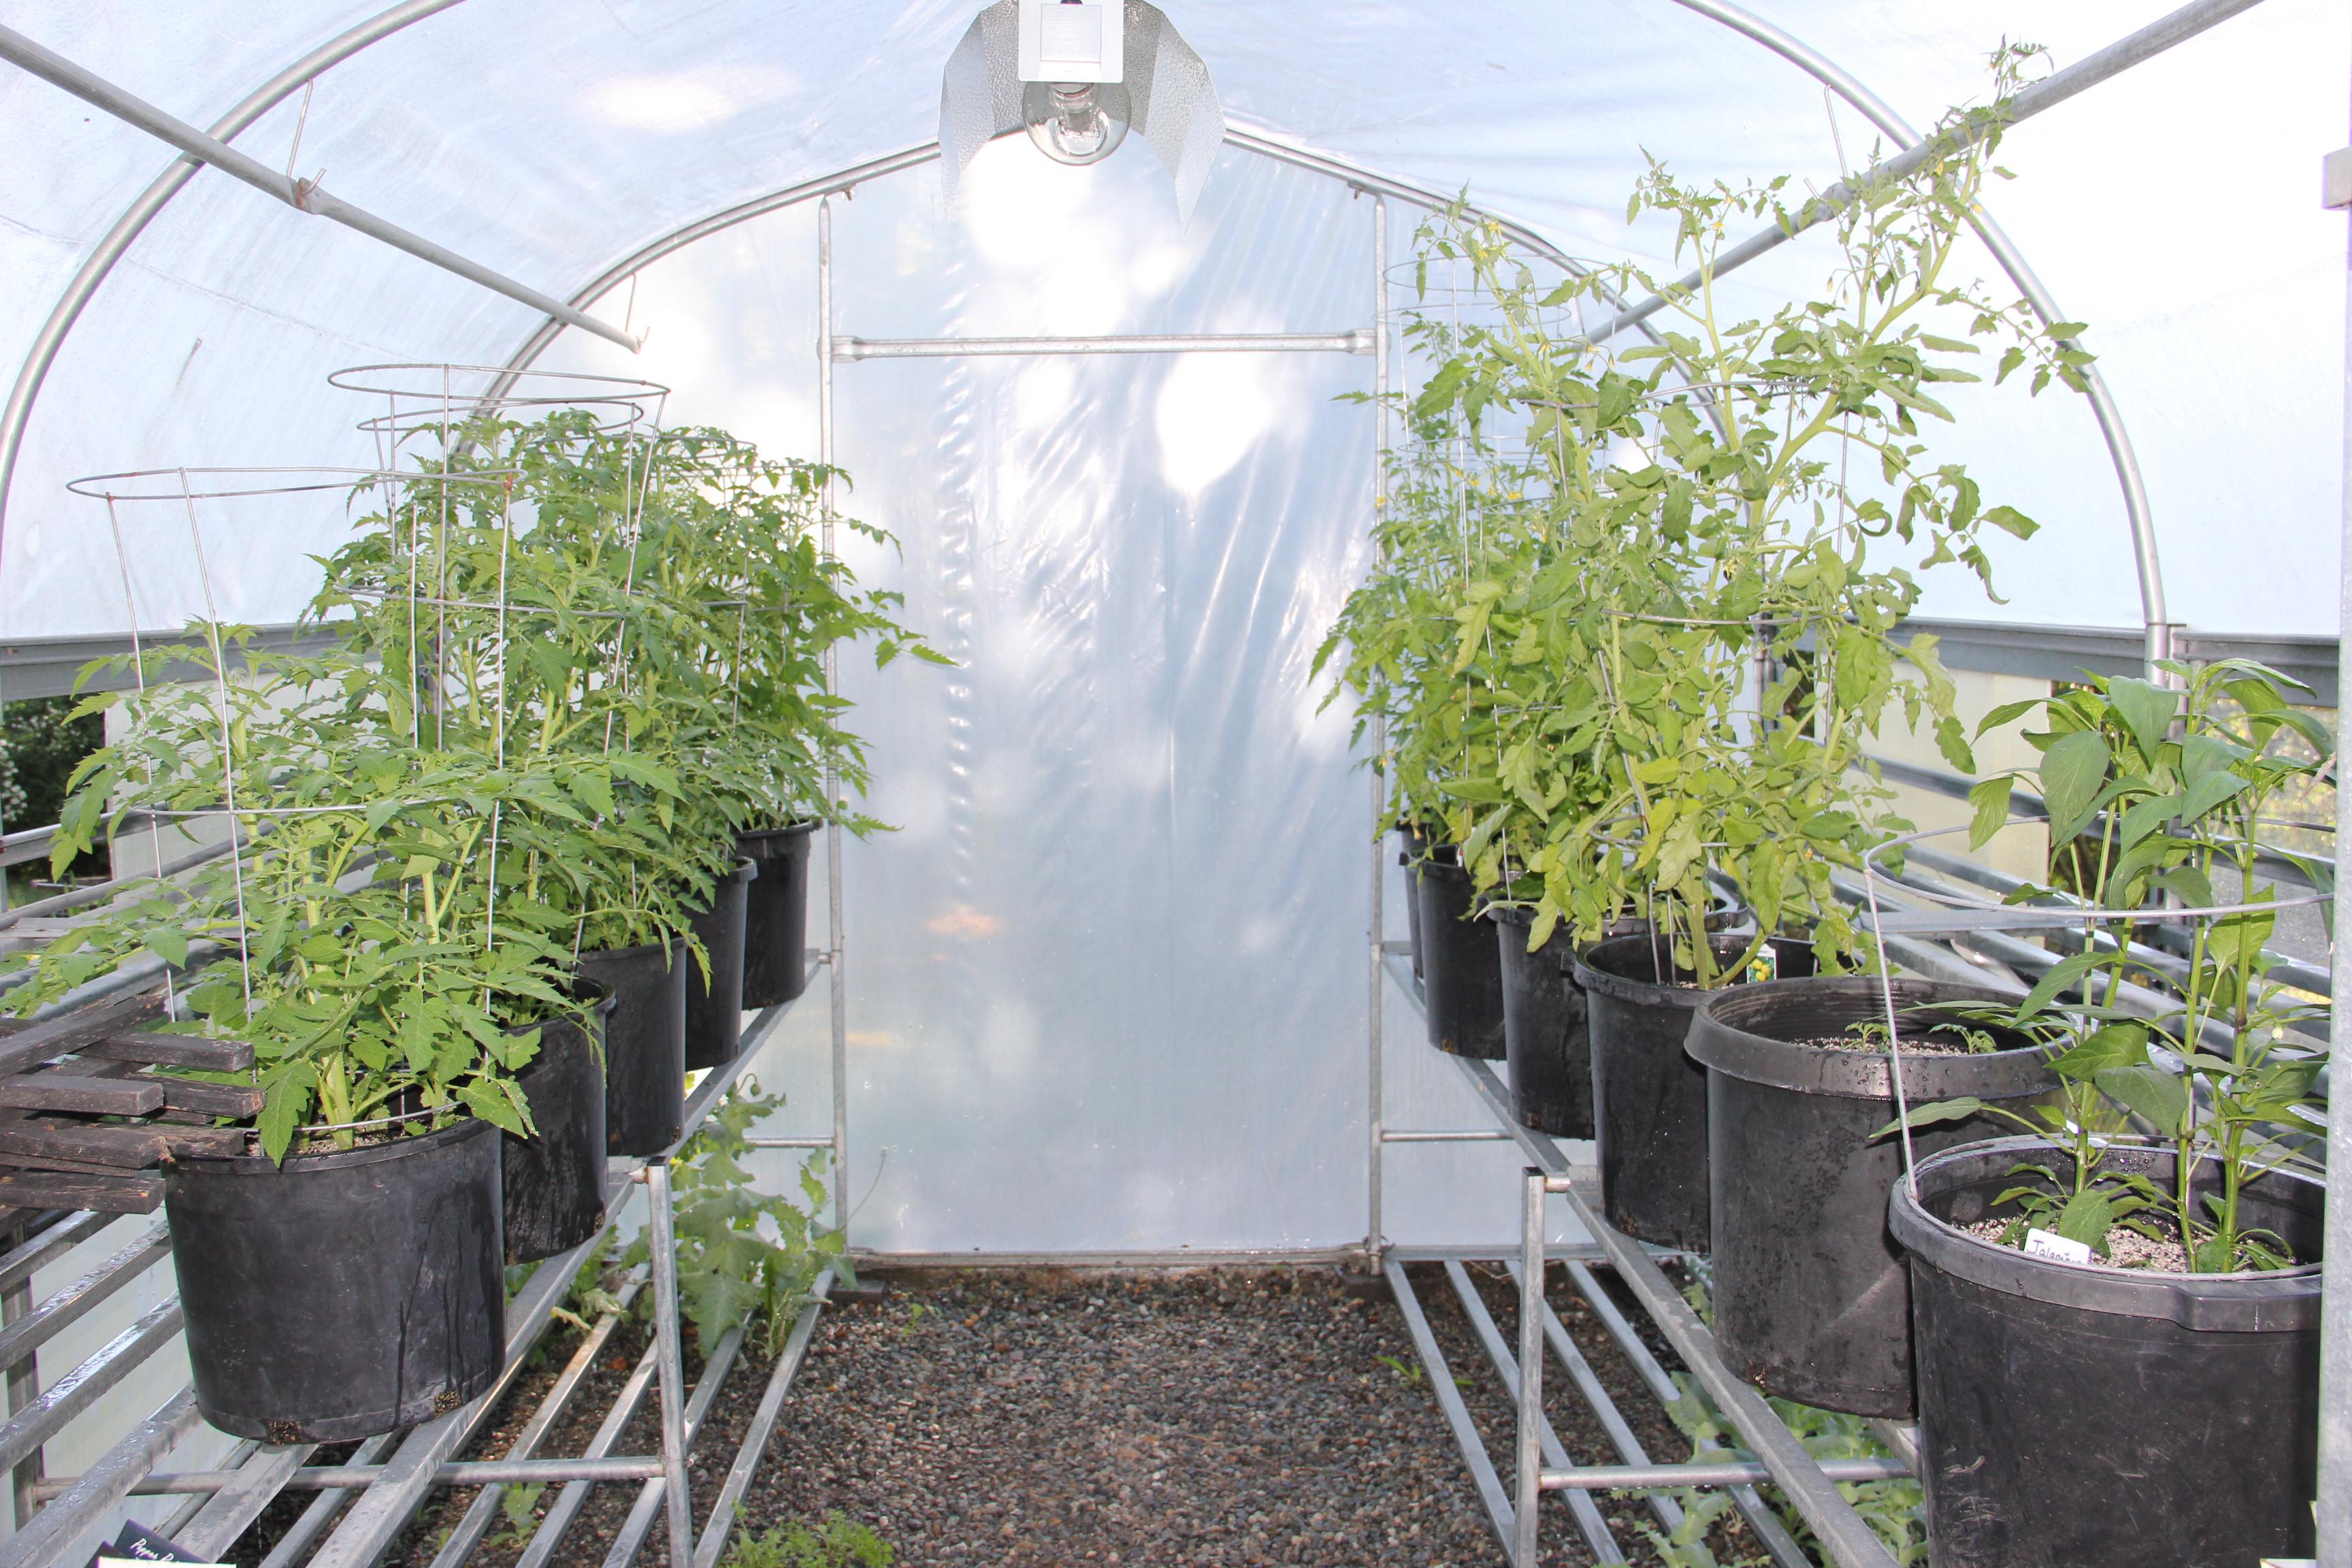 Tomato time gardens at coppertop for When to transplant lemon tree seedlings